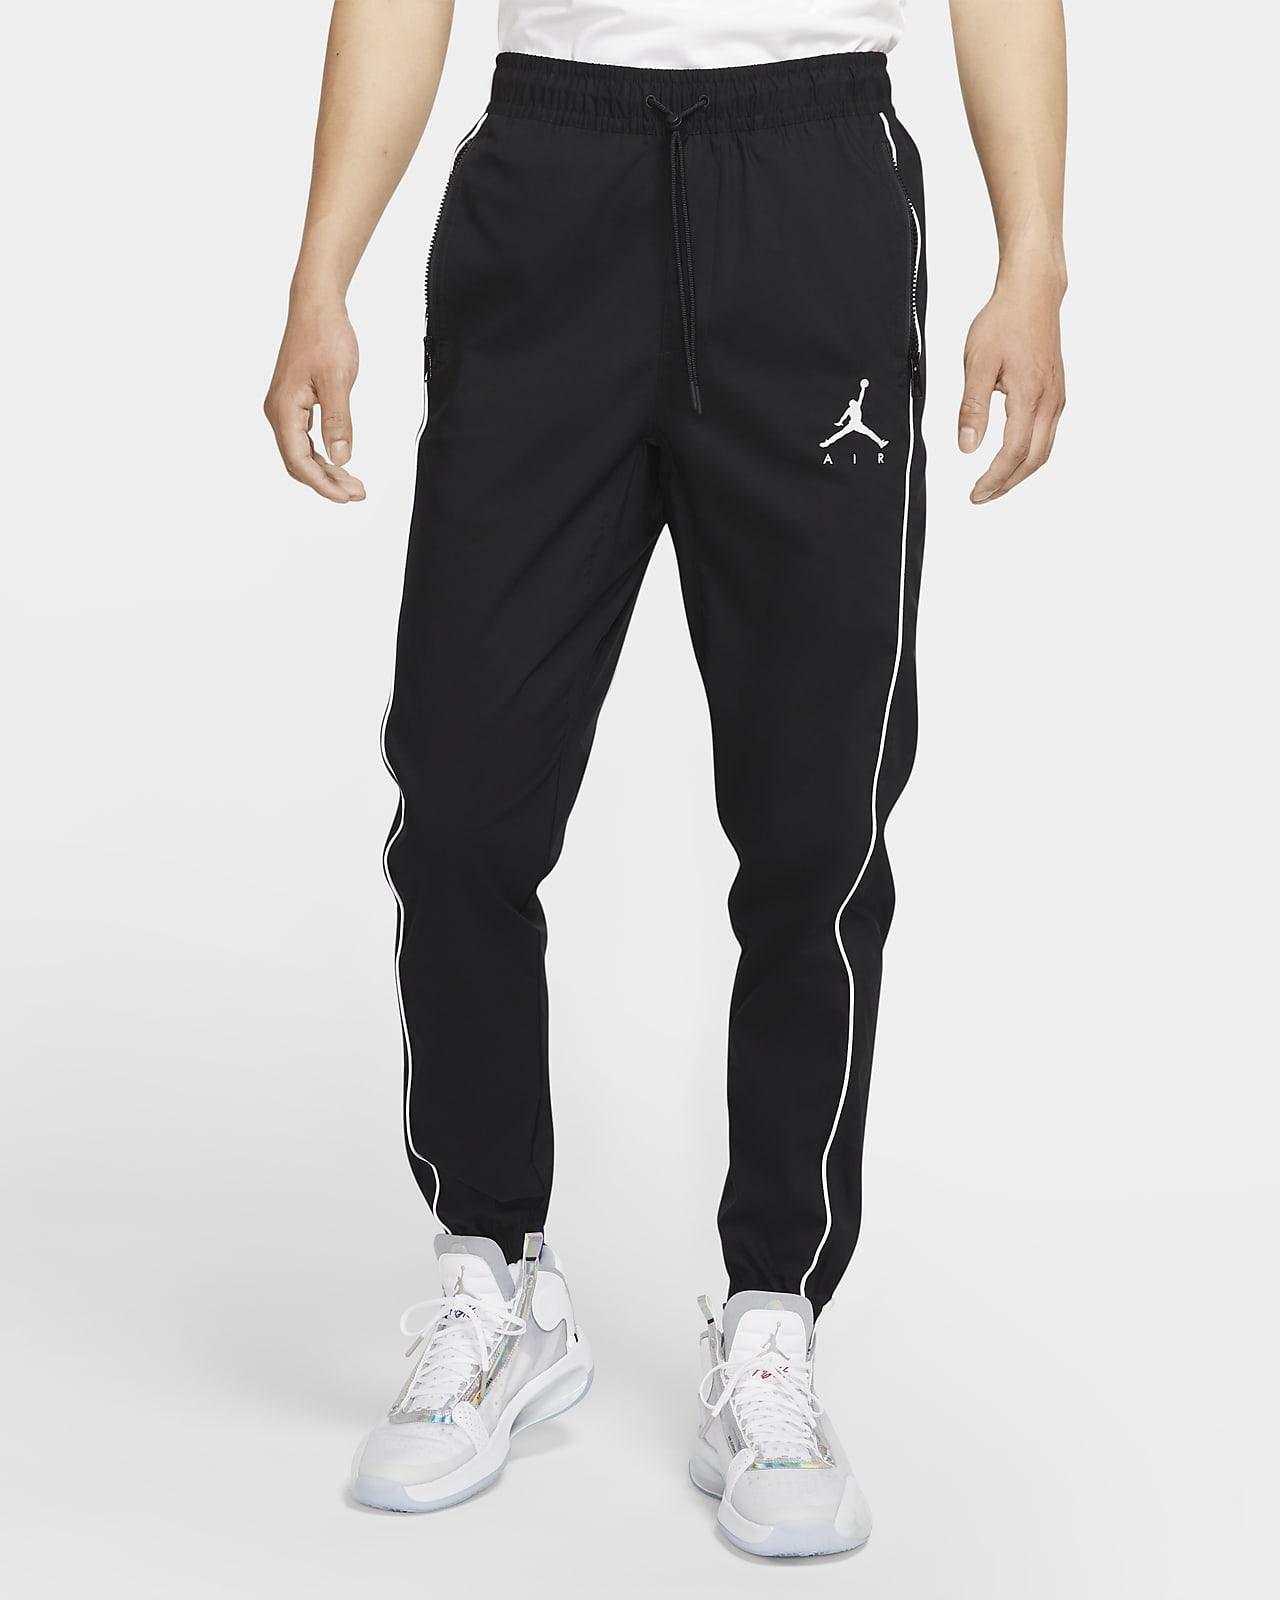 Jordan Jumpman Men's Woven Trousers